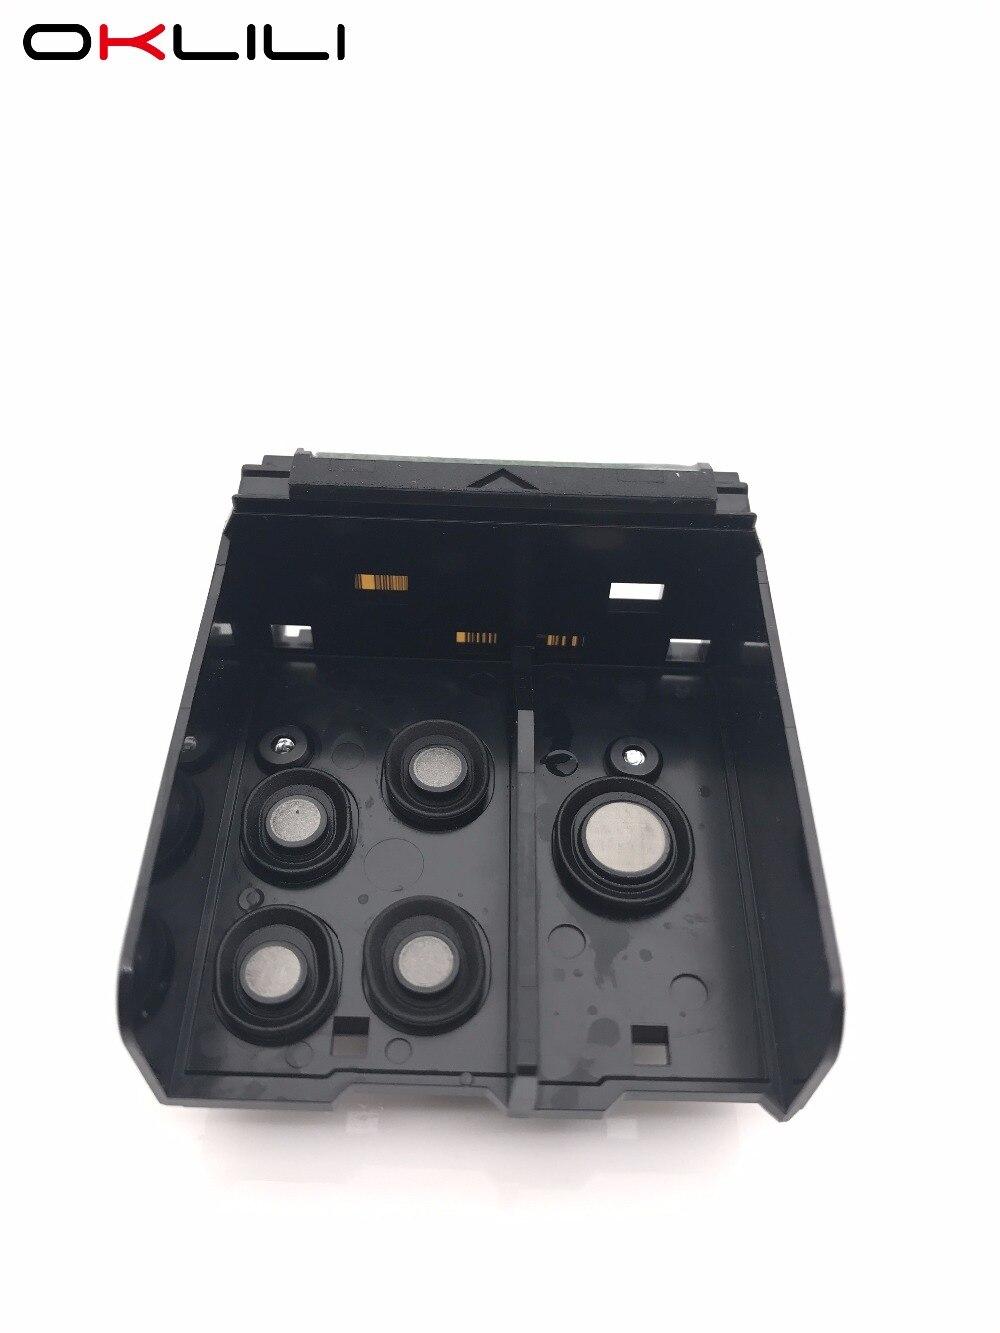 OKLILI ORIGINAL QY6-0068 QY6-0068-000 Printhead Print Head Printer Head for Canon PIXMA iP100<br>